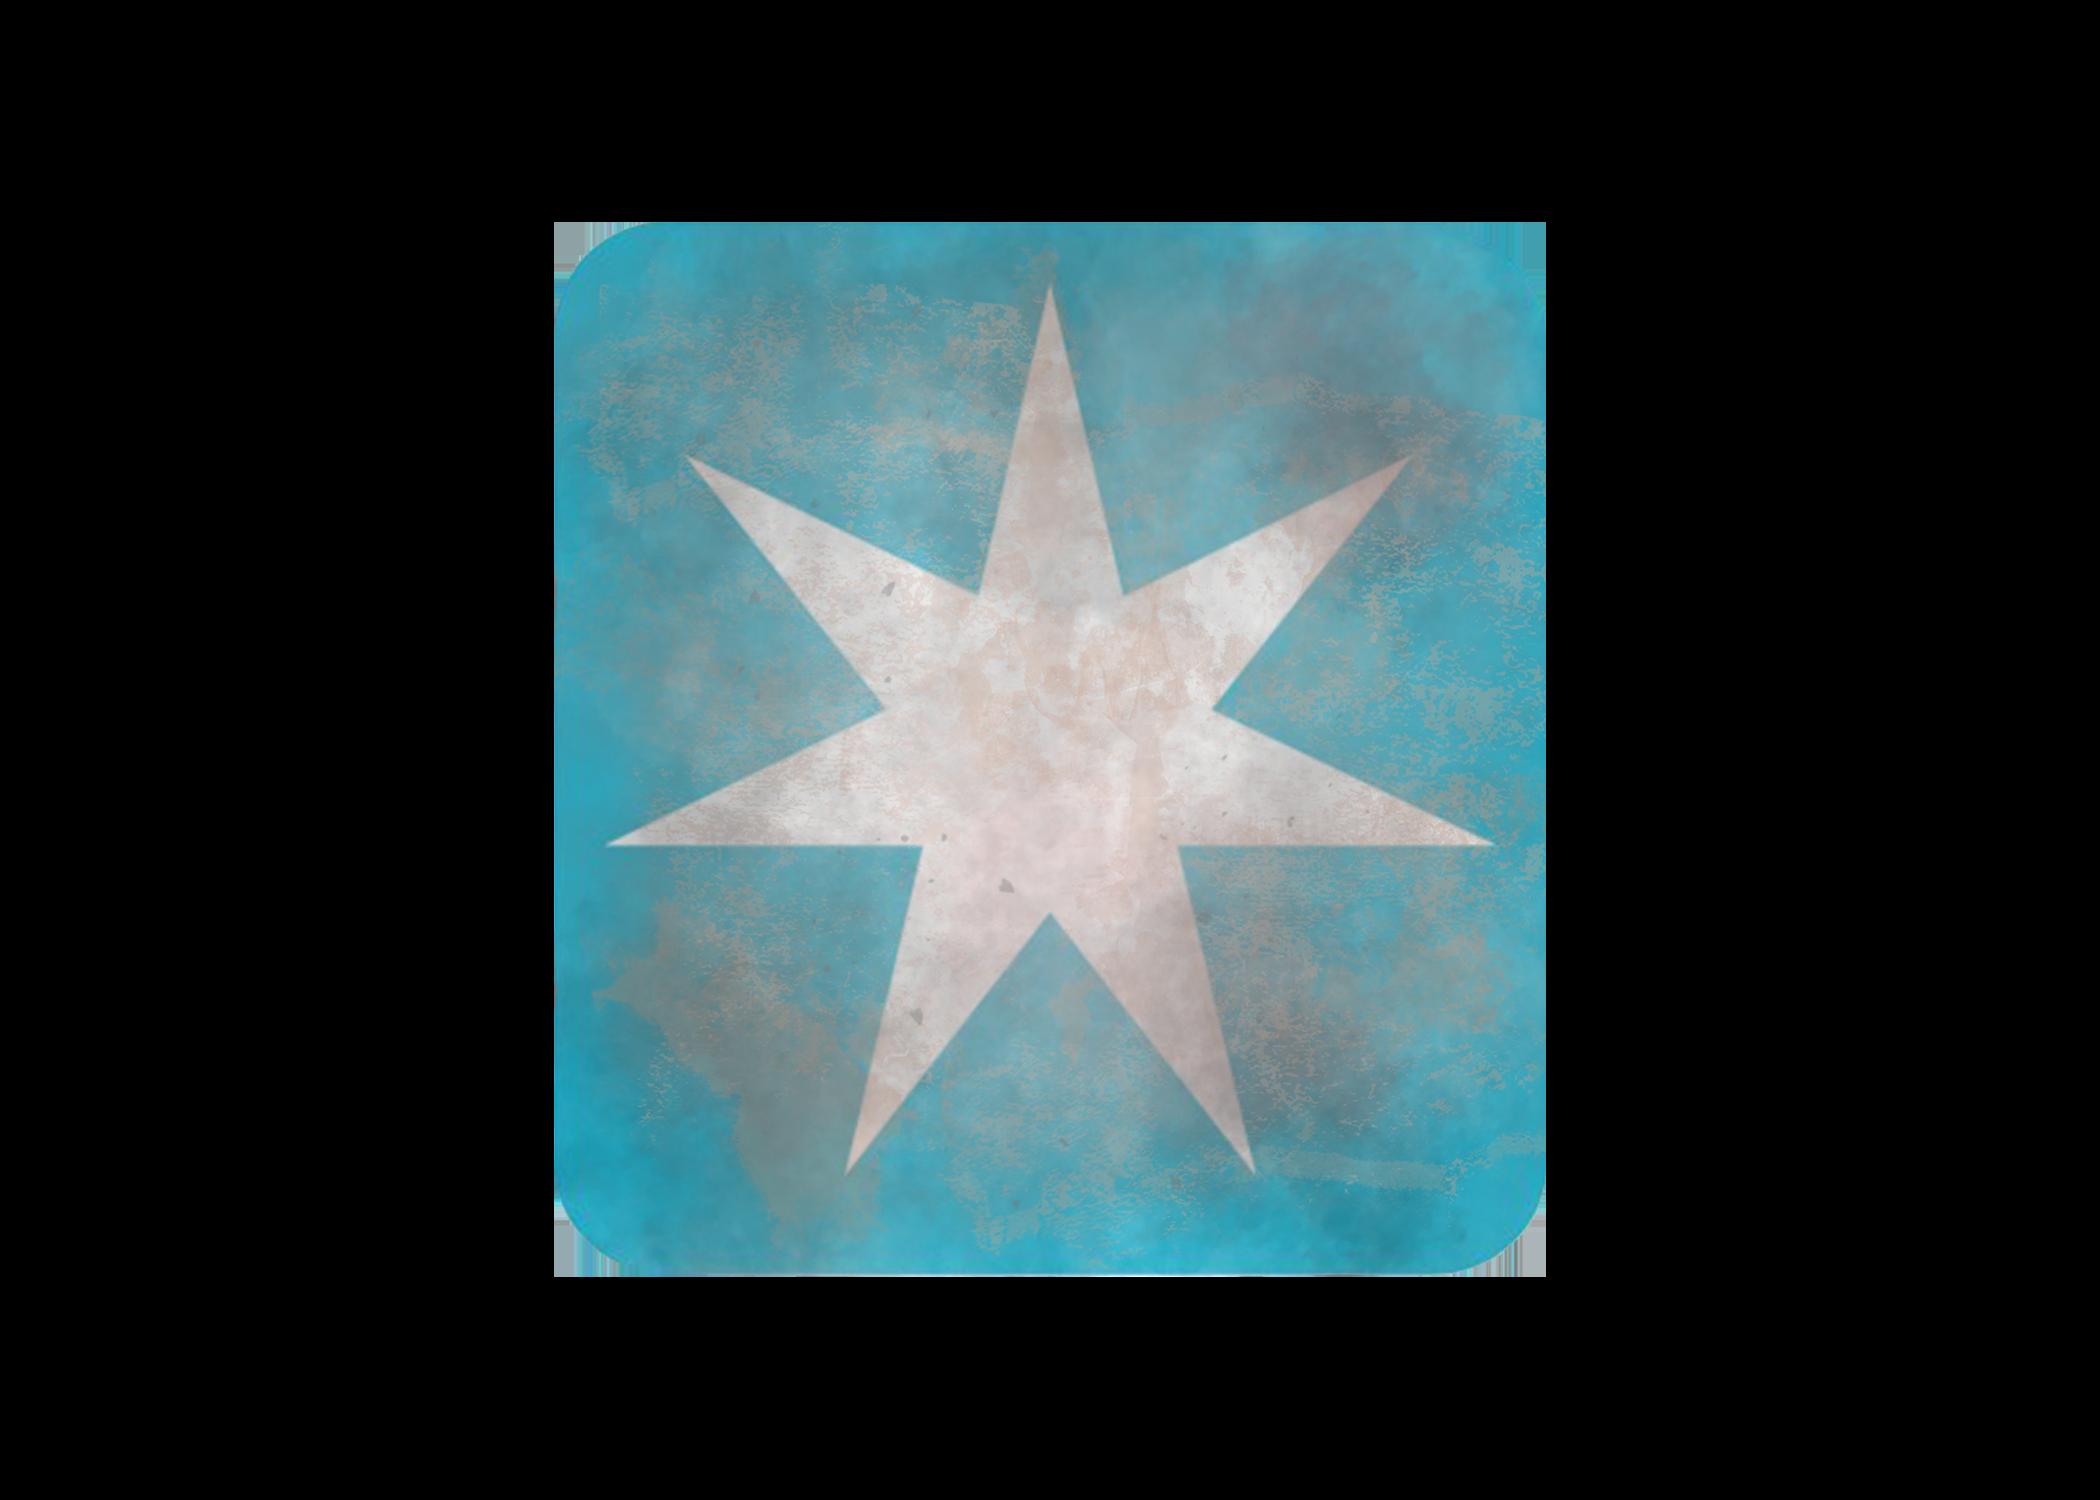 1046229394_logo1.jpg.png.bd5d530ef9f11159743c8f9bb74df3e4.png